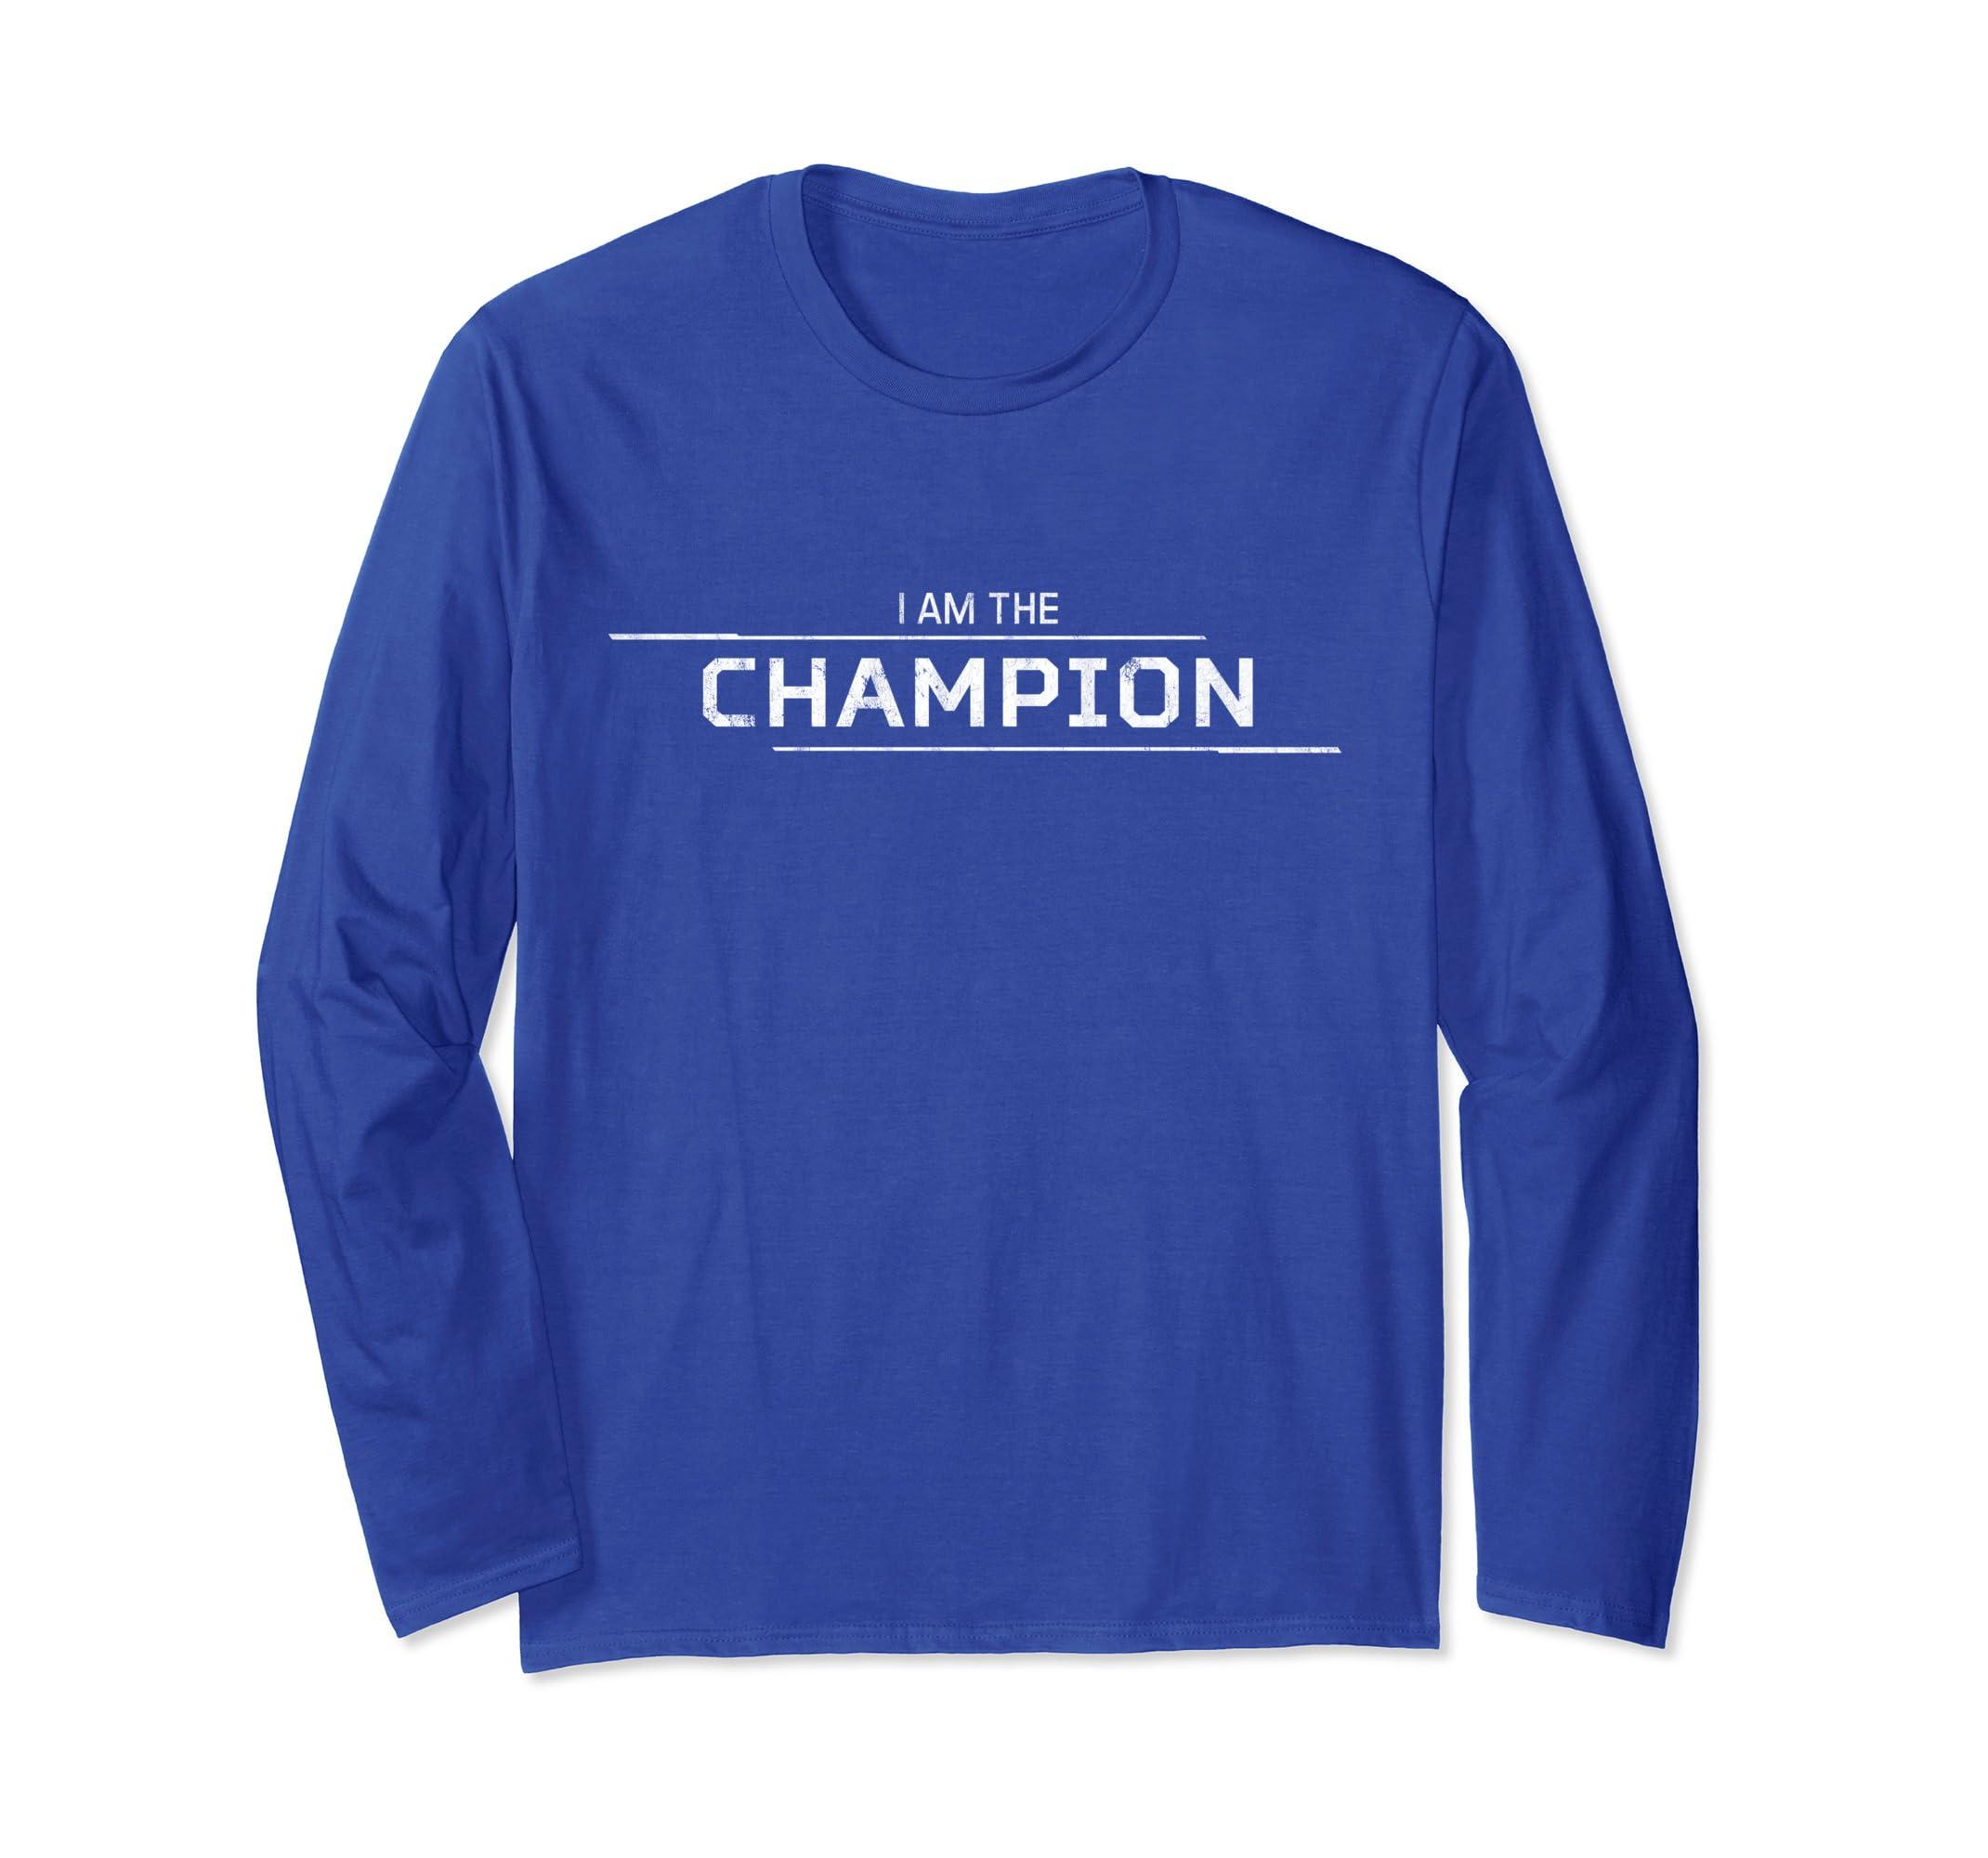 7884dad9 Amazon.com: Legends Champion Gamer Vintage LS T-Shirt Gift Men Women:  Clothing